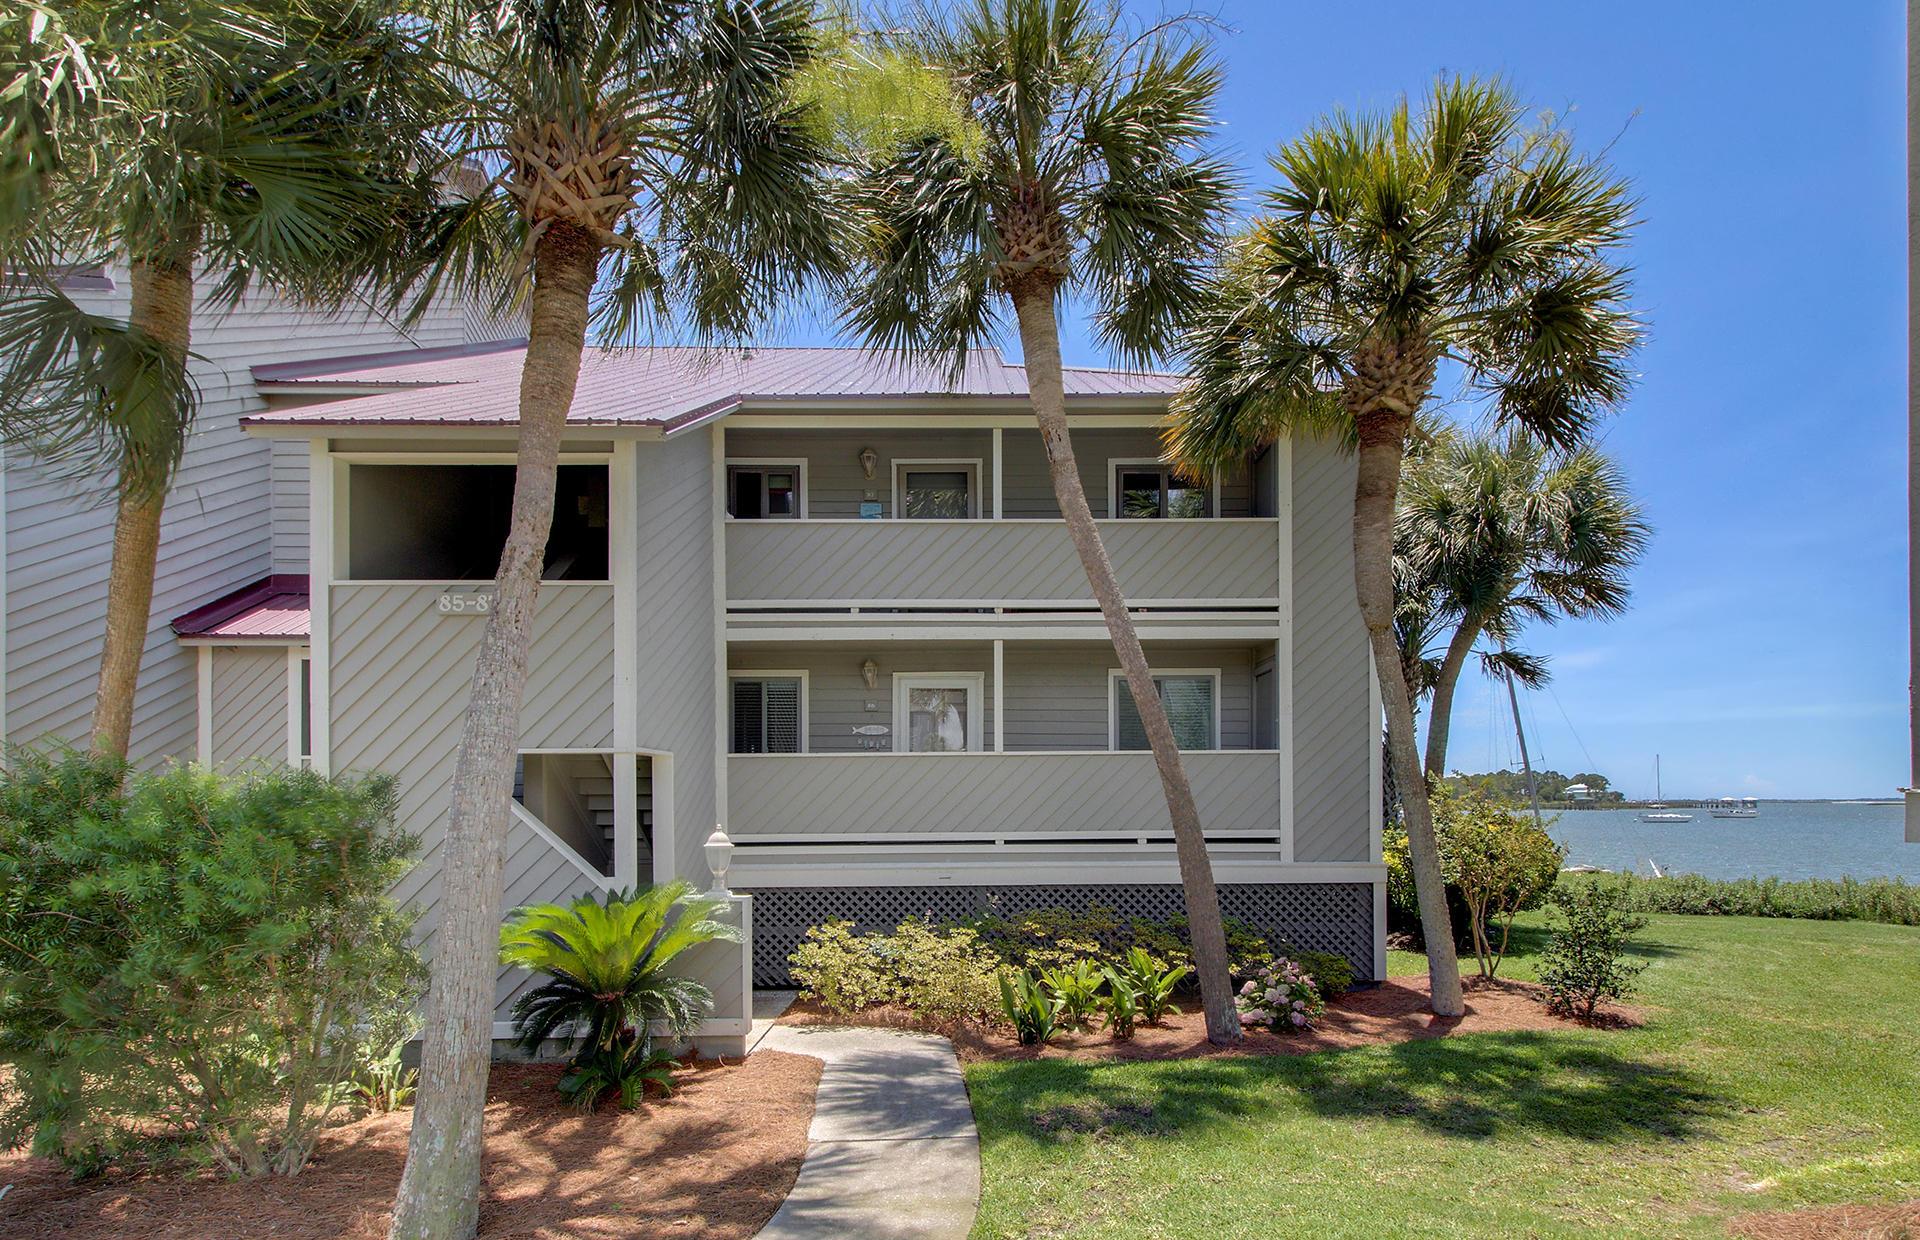 86 W Mariners Cay Drive Folly Beach, SC 29439